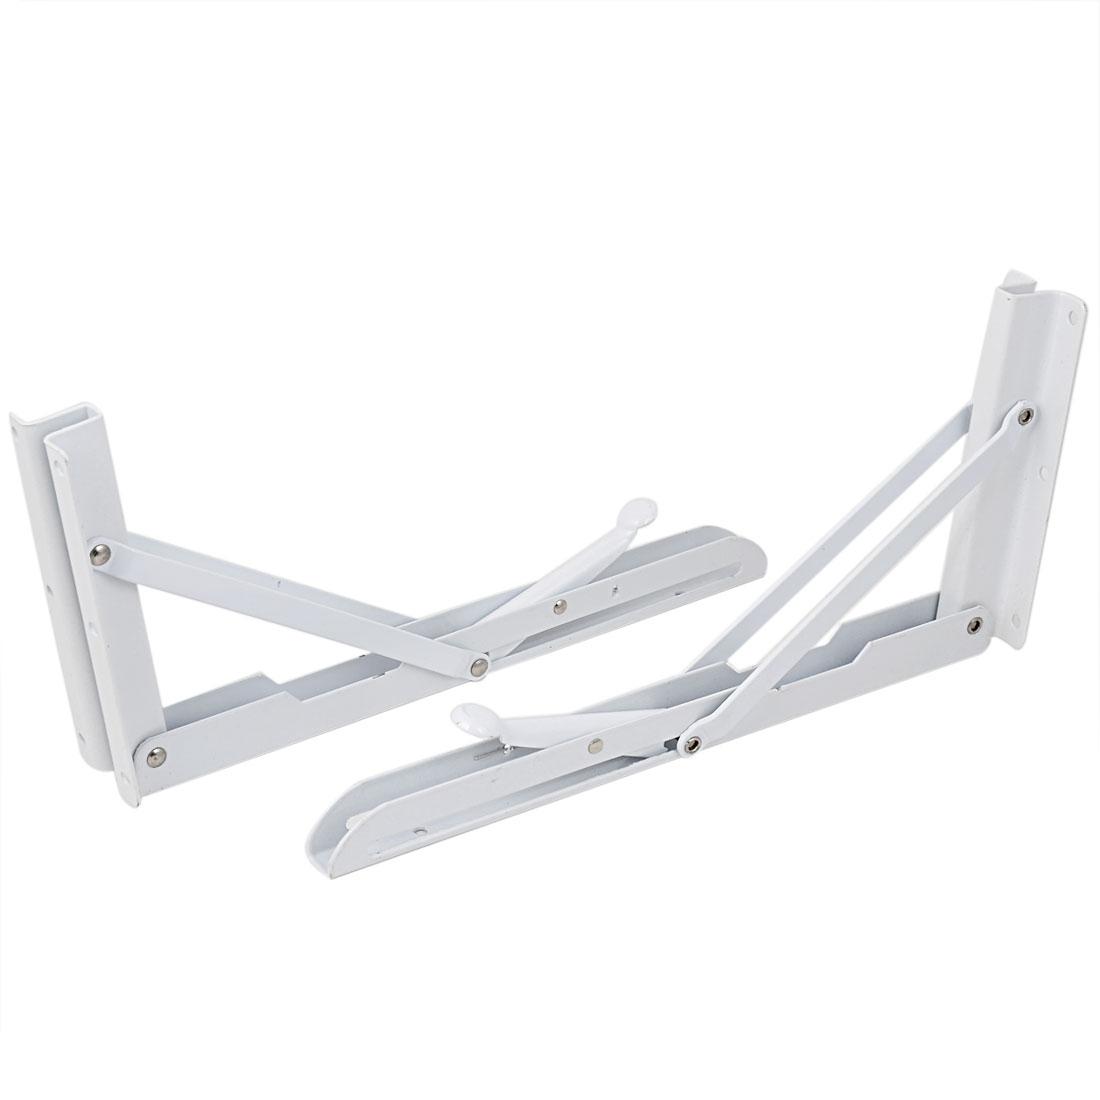 30cmx15cm Metal Long Release Triangle Folding Support Shelf Bracket Brace White 2pcs